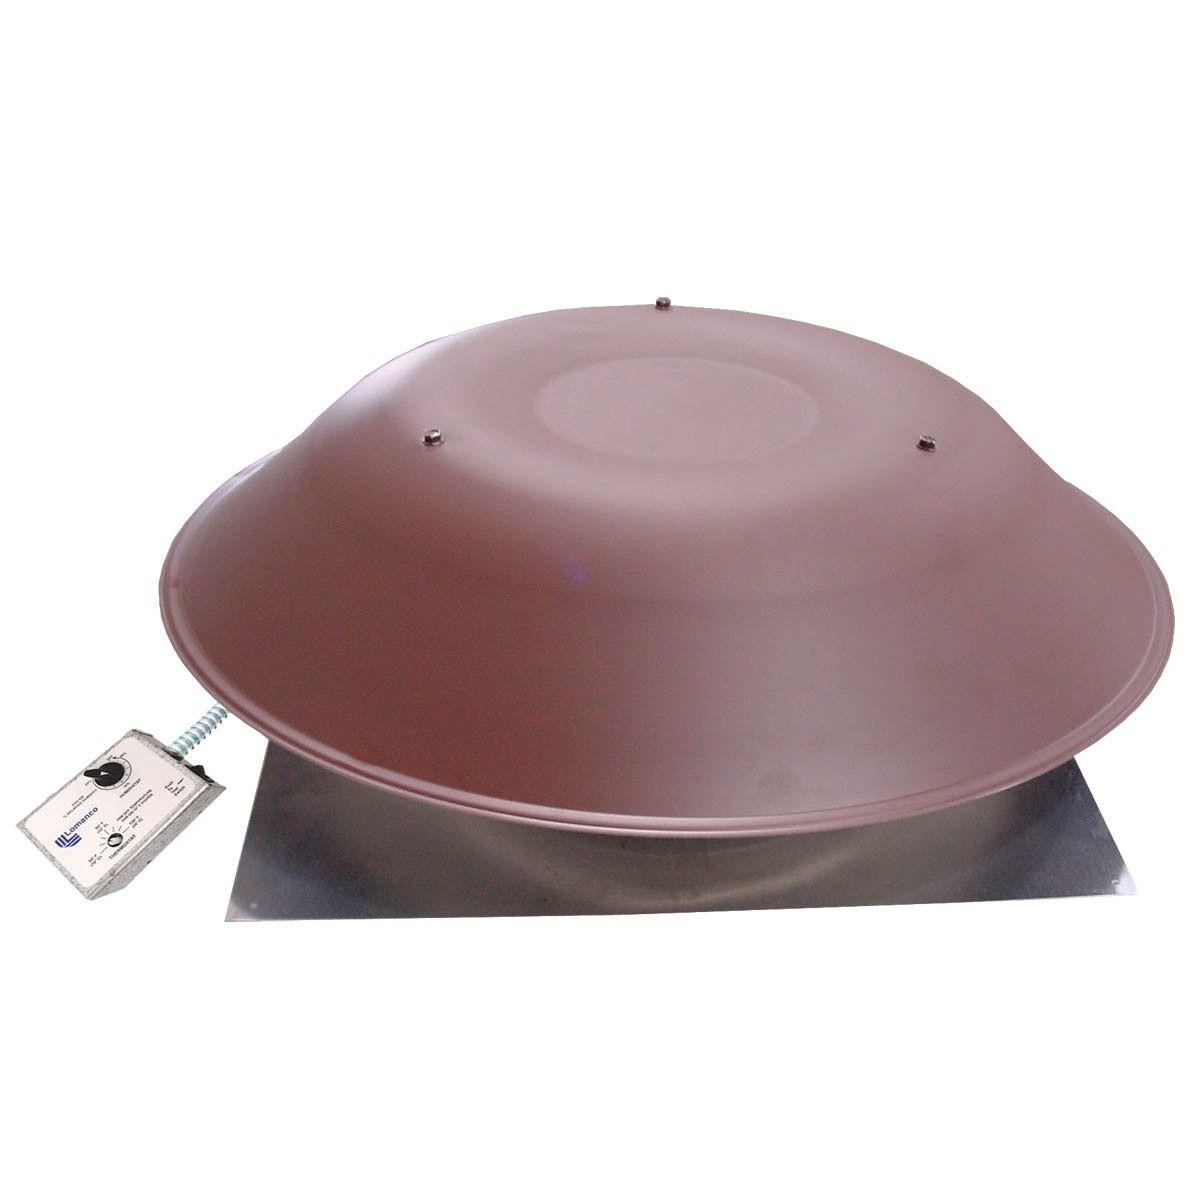 Lomanco 2000 Brown 3.4 Amp Brown Power Roof Ventilator (Ventilator Roof 3.4a) (Metal)